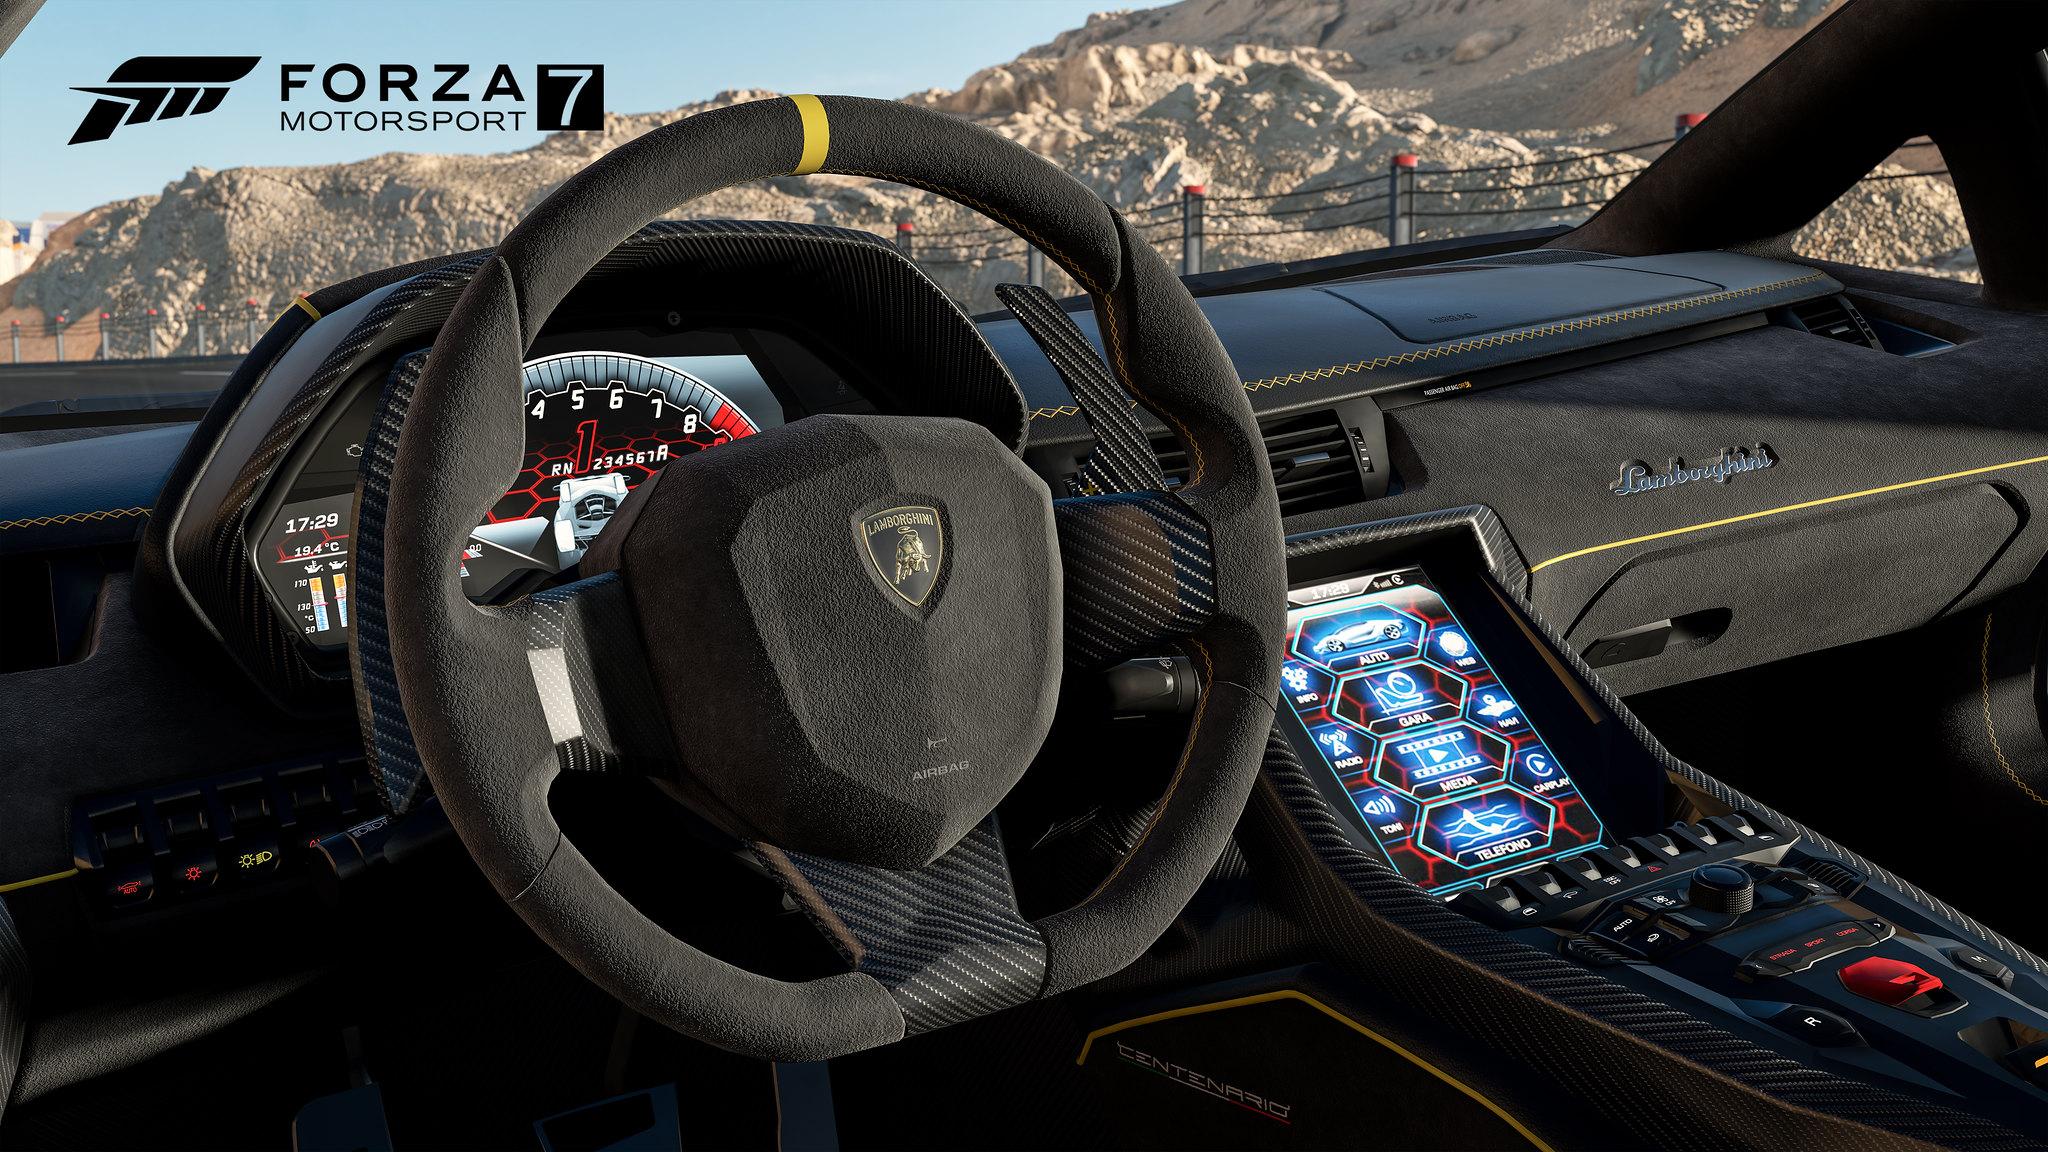 Forza7_E3_PressKit_06_LamborghiniCockpit_WM_4K